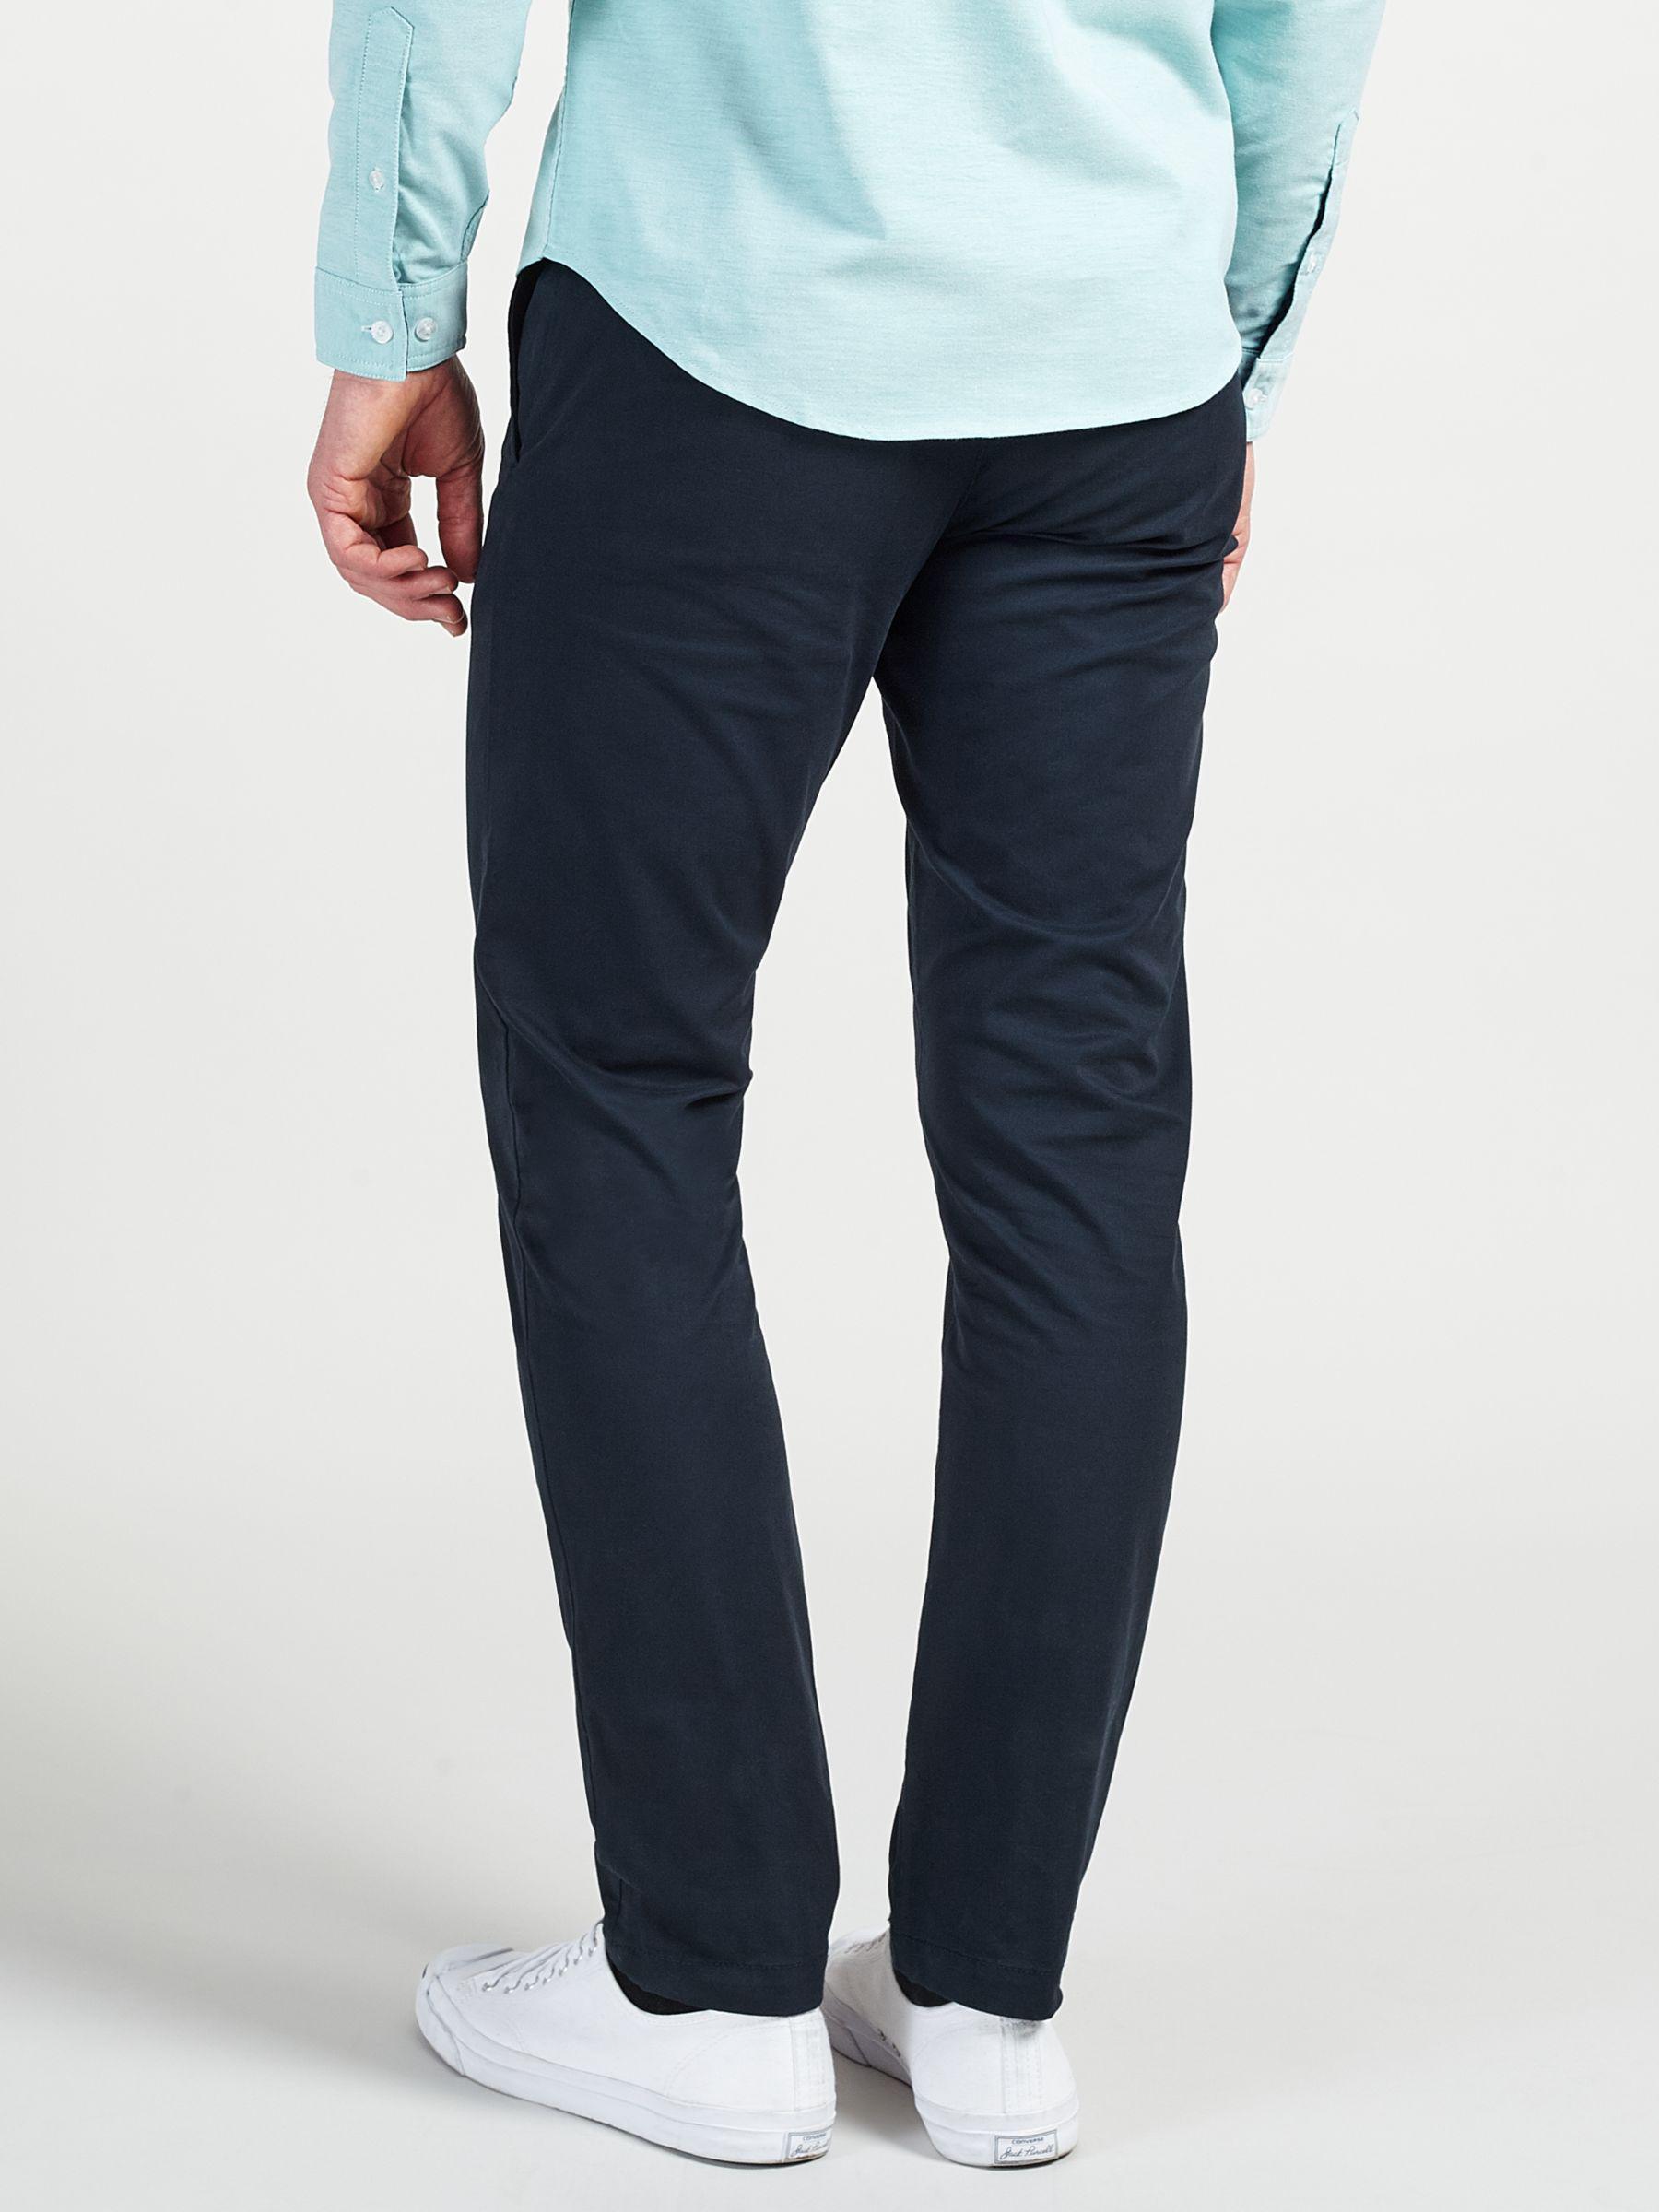 Original Penguin Cotton Slim Stretch Chinos in Navy (Blue) for Men